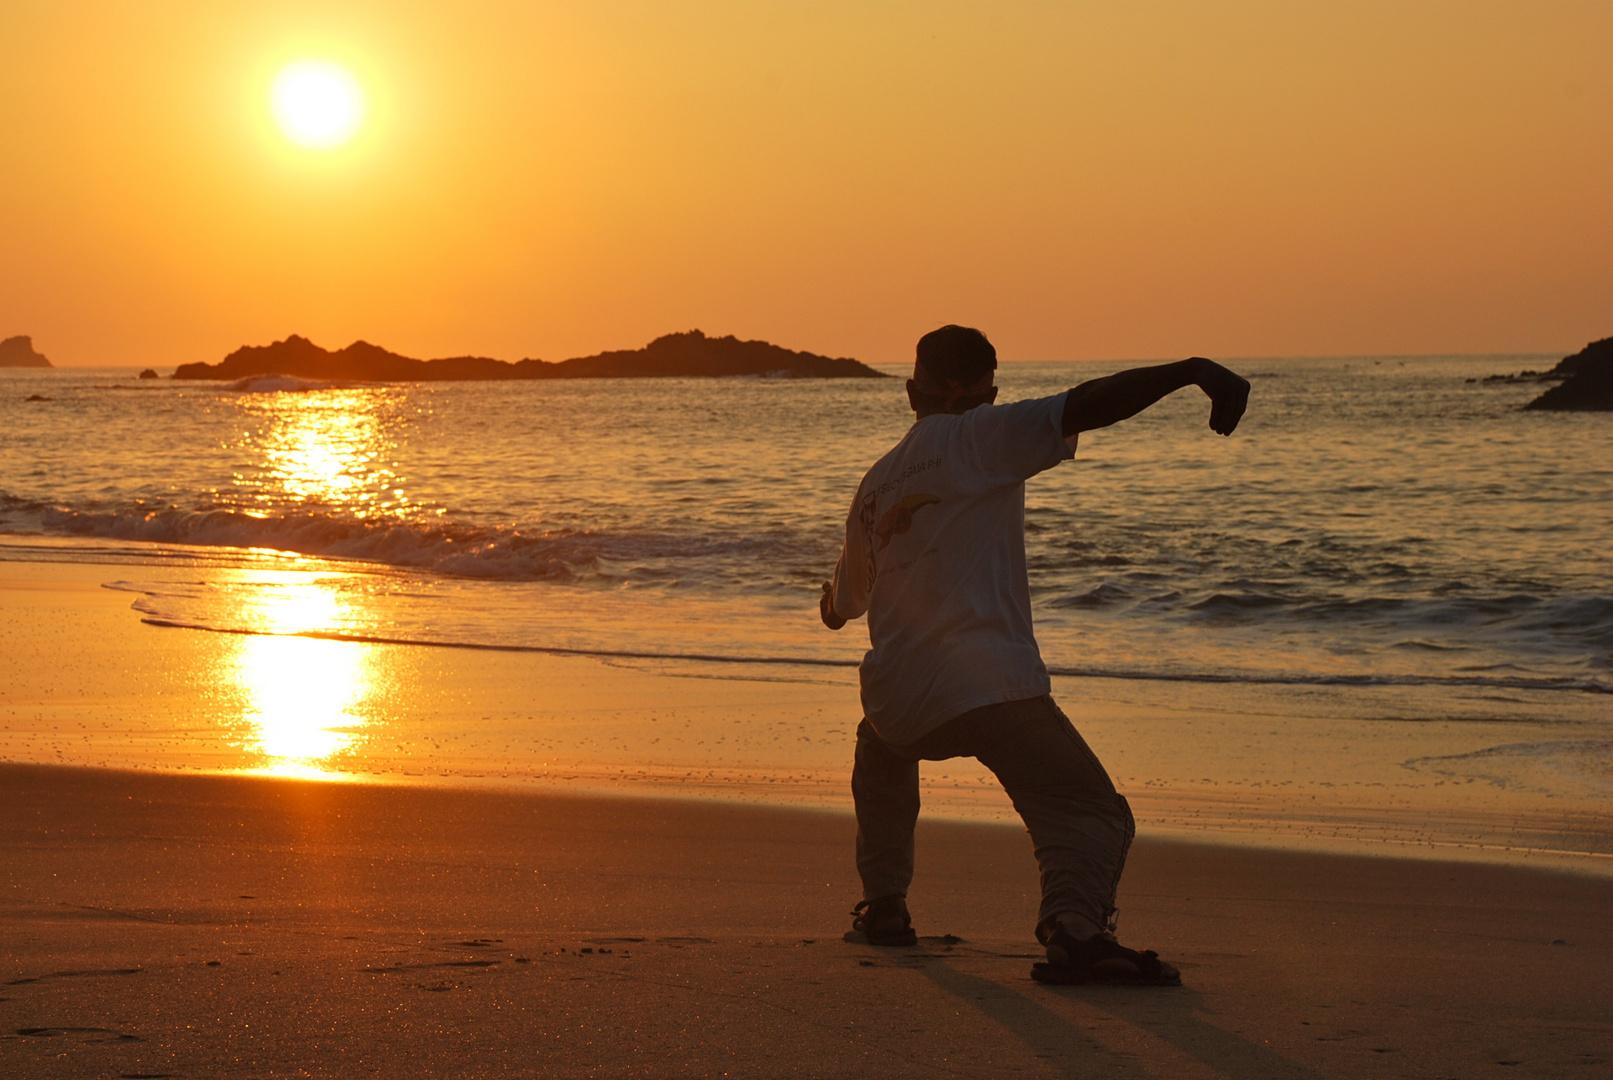 Karatekit am Strand